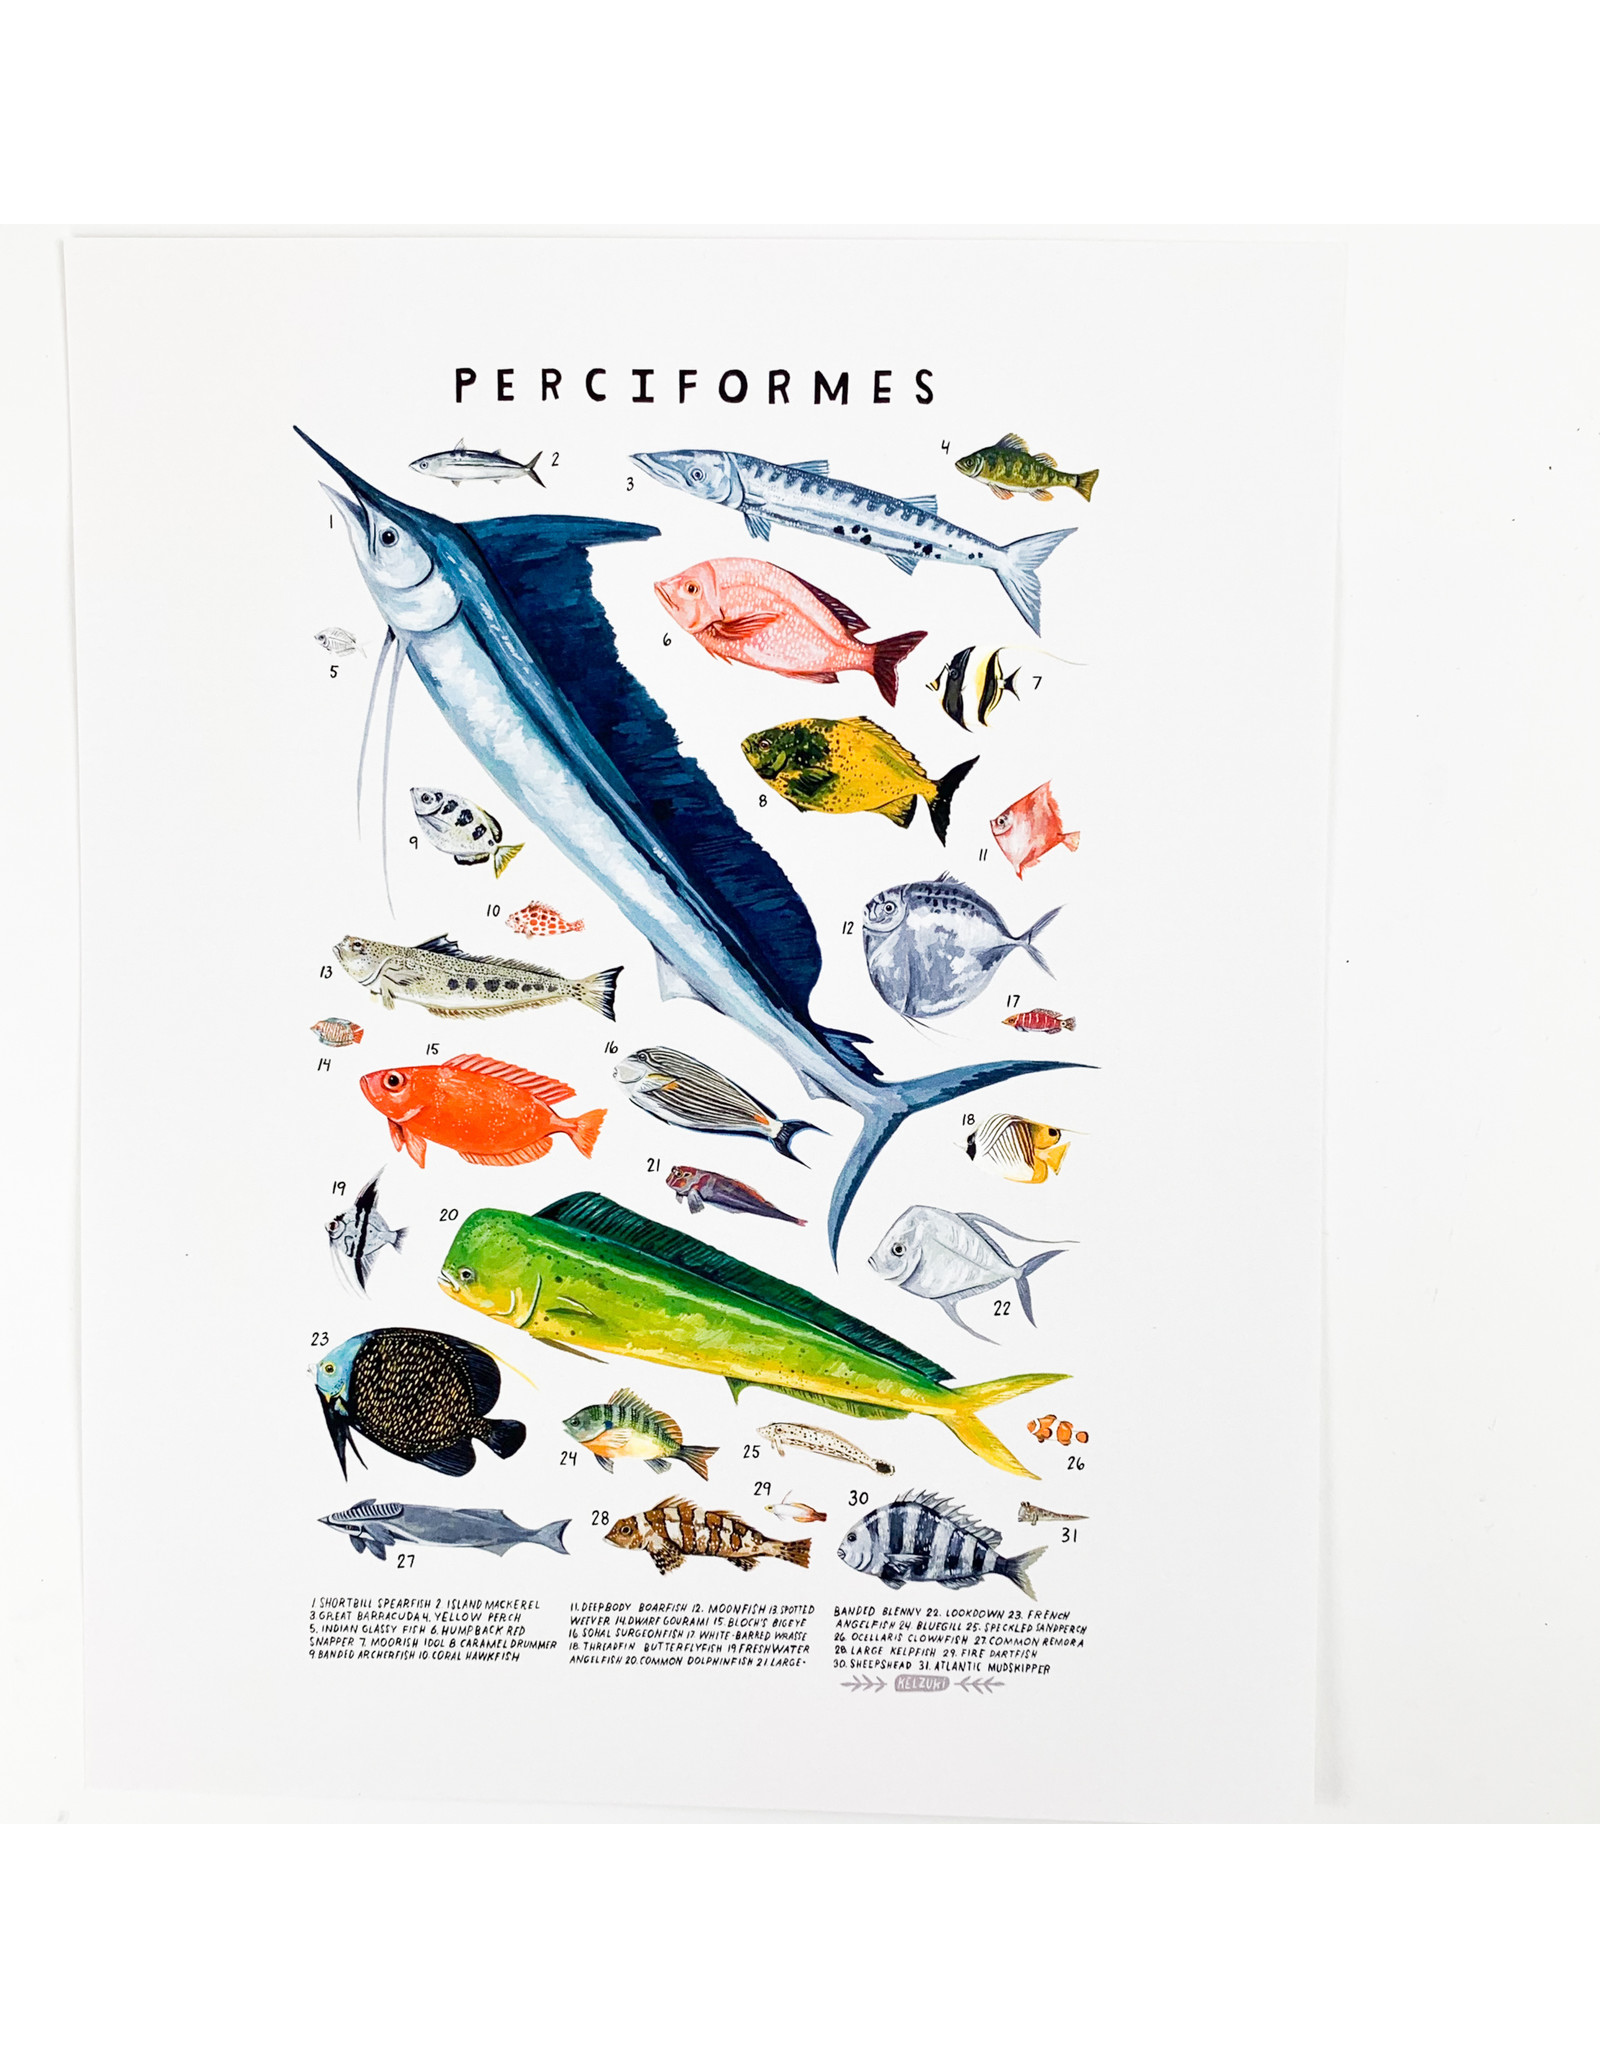 Kelzuki/Consignment Mini Print Consignment - Perciformes